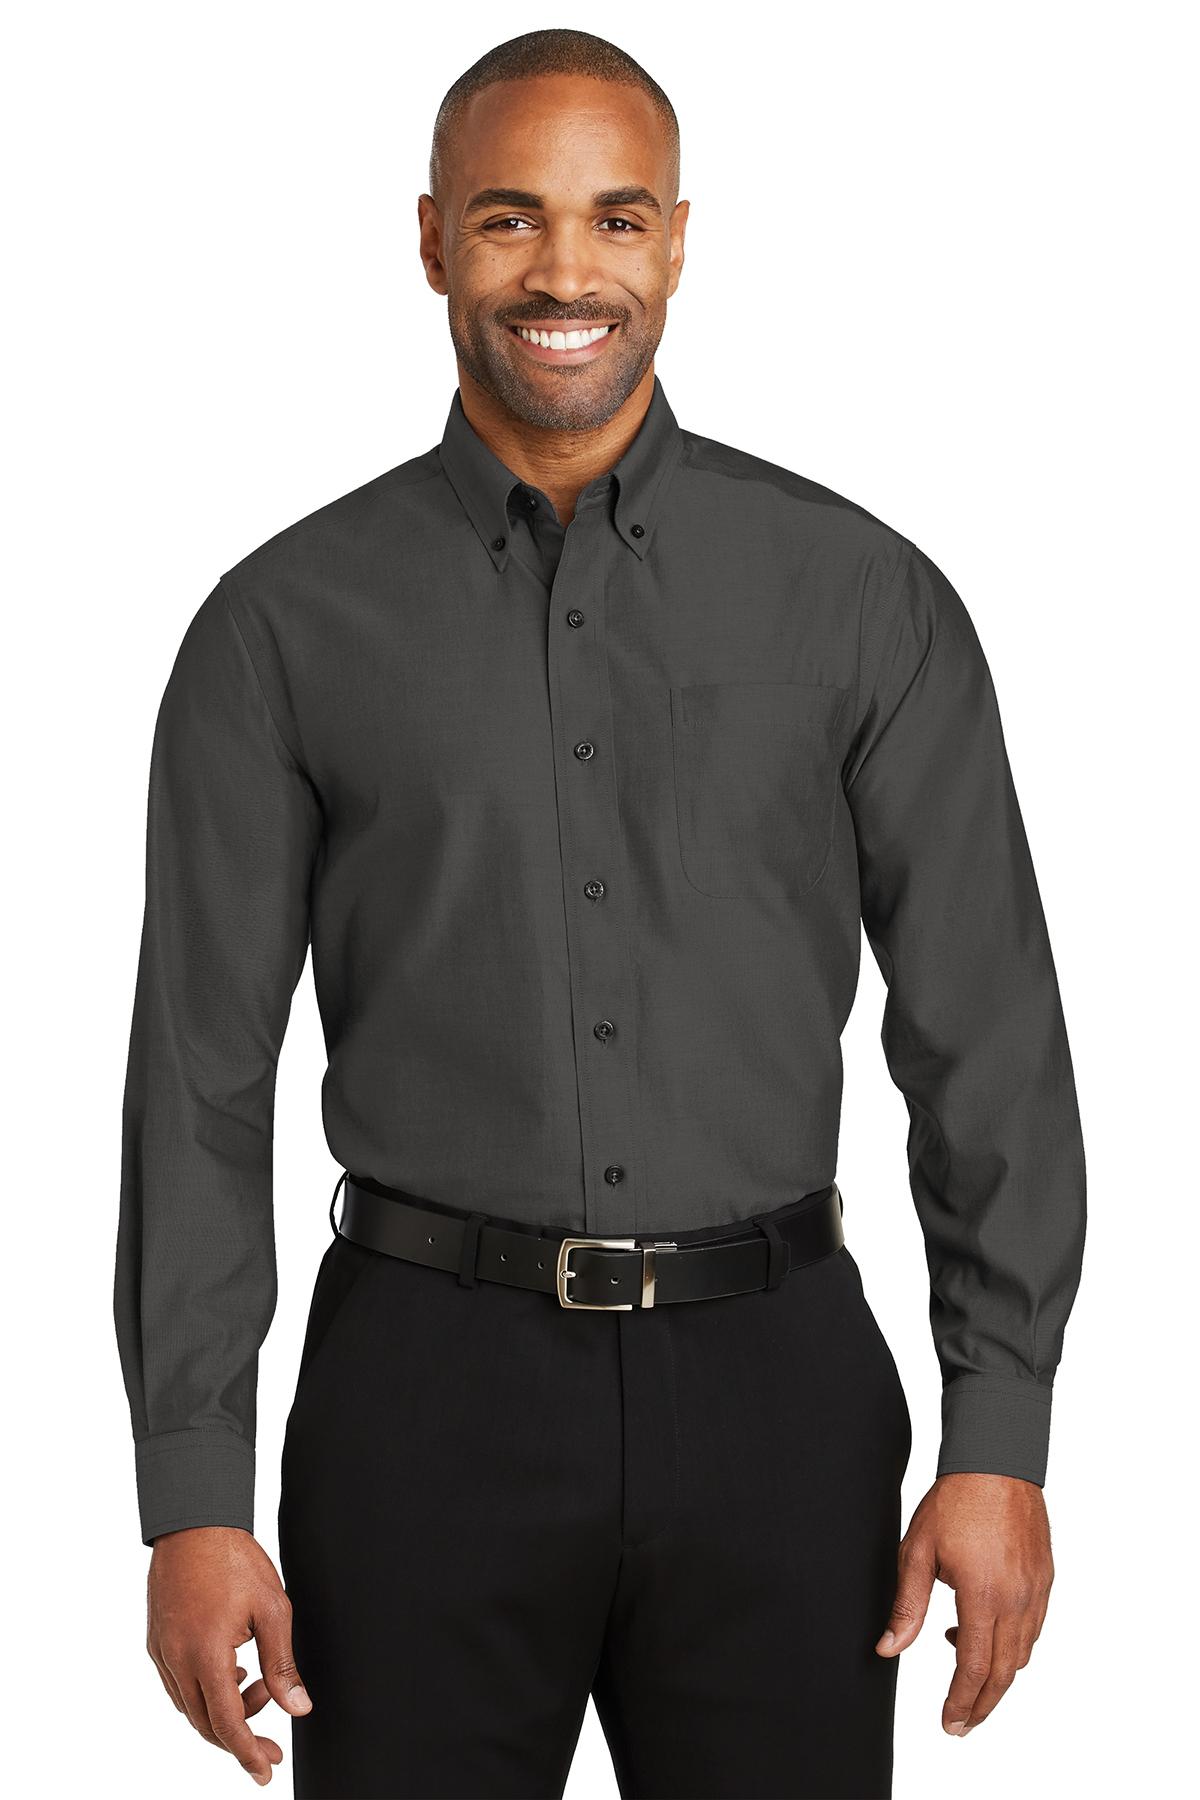 cc09e8e8f4d Red House® Tall Non-Iron Pinpoint Oxford Shirt